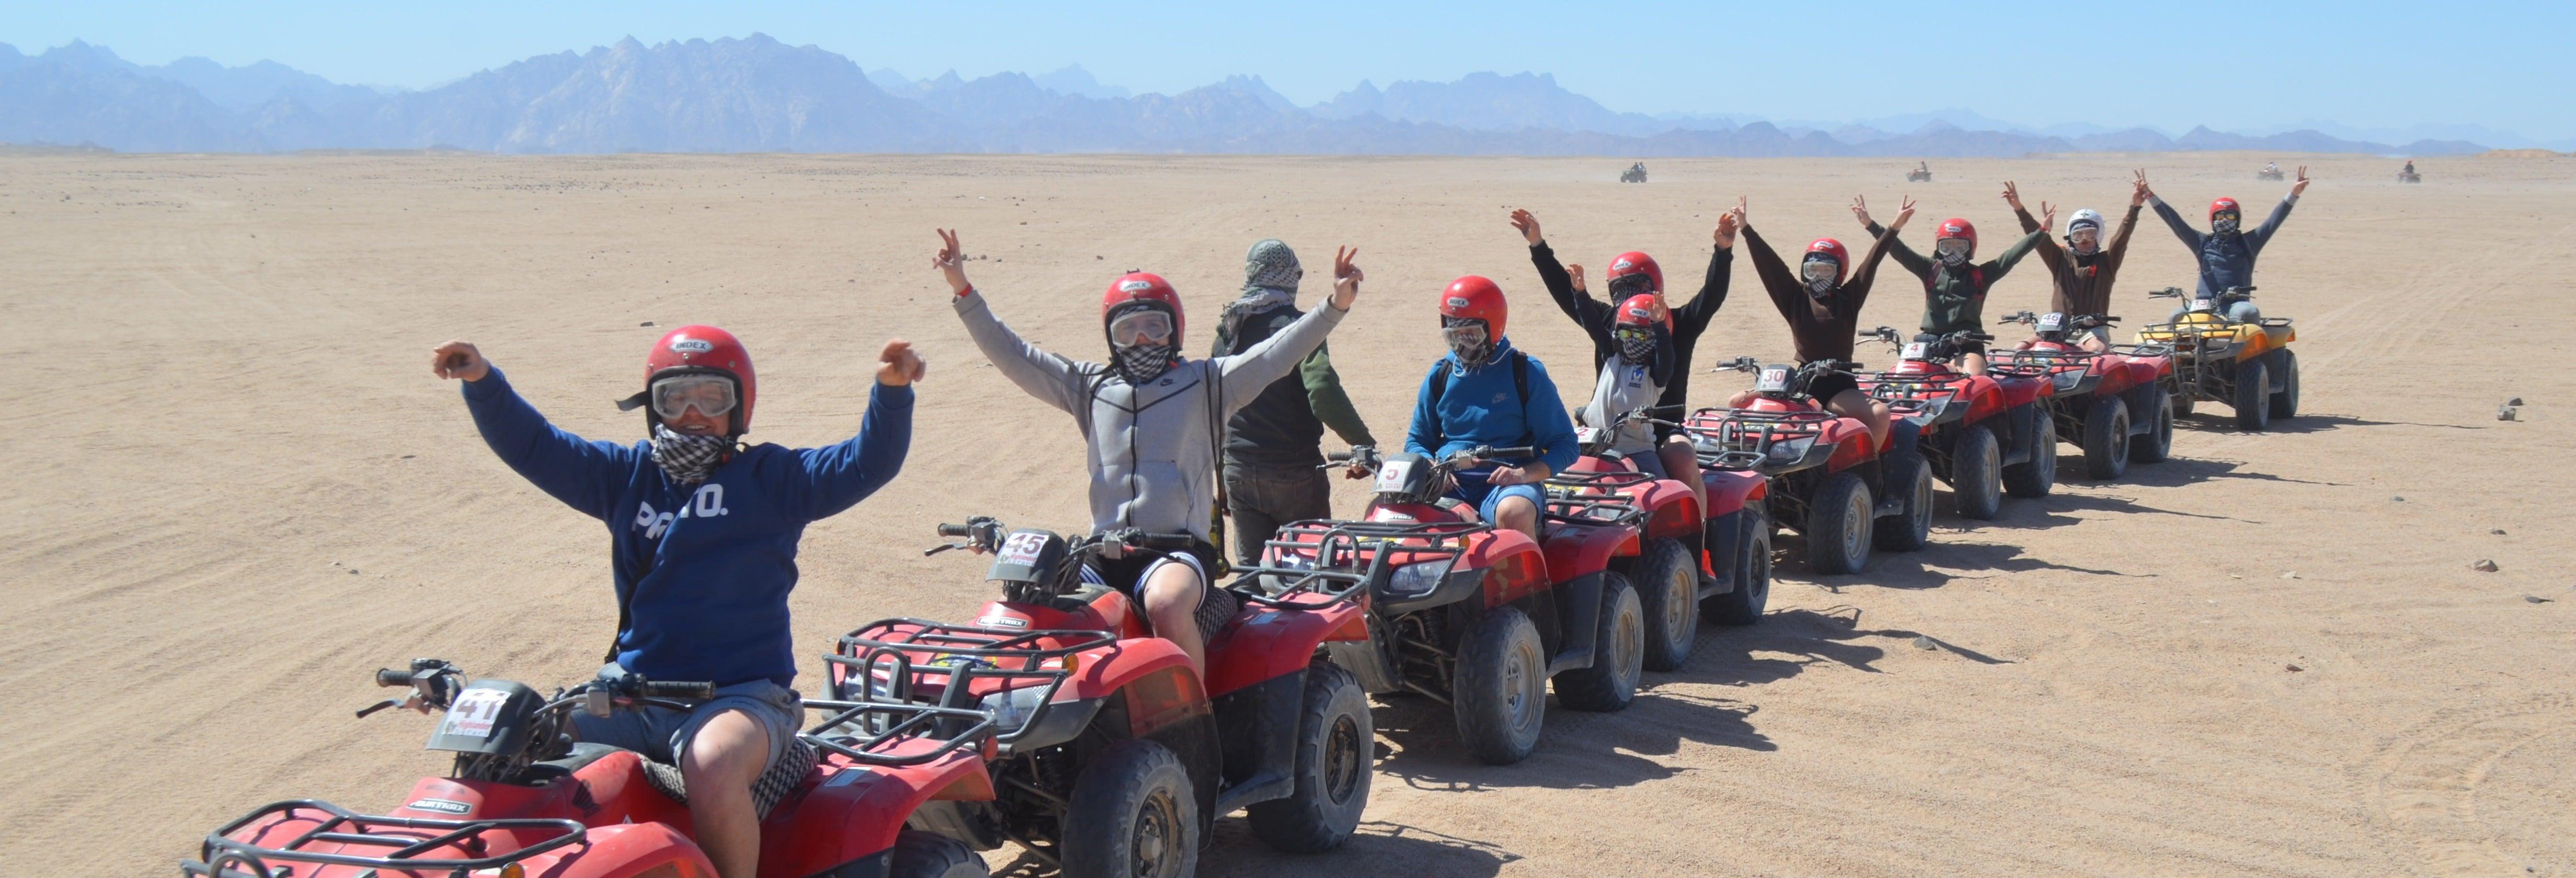 Quad Bike & Dune Buggy Safari